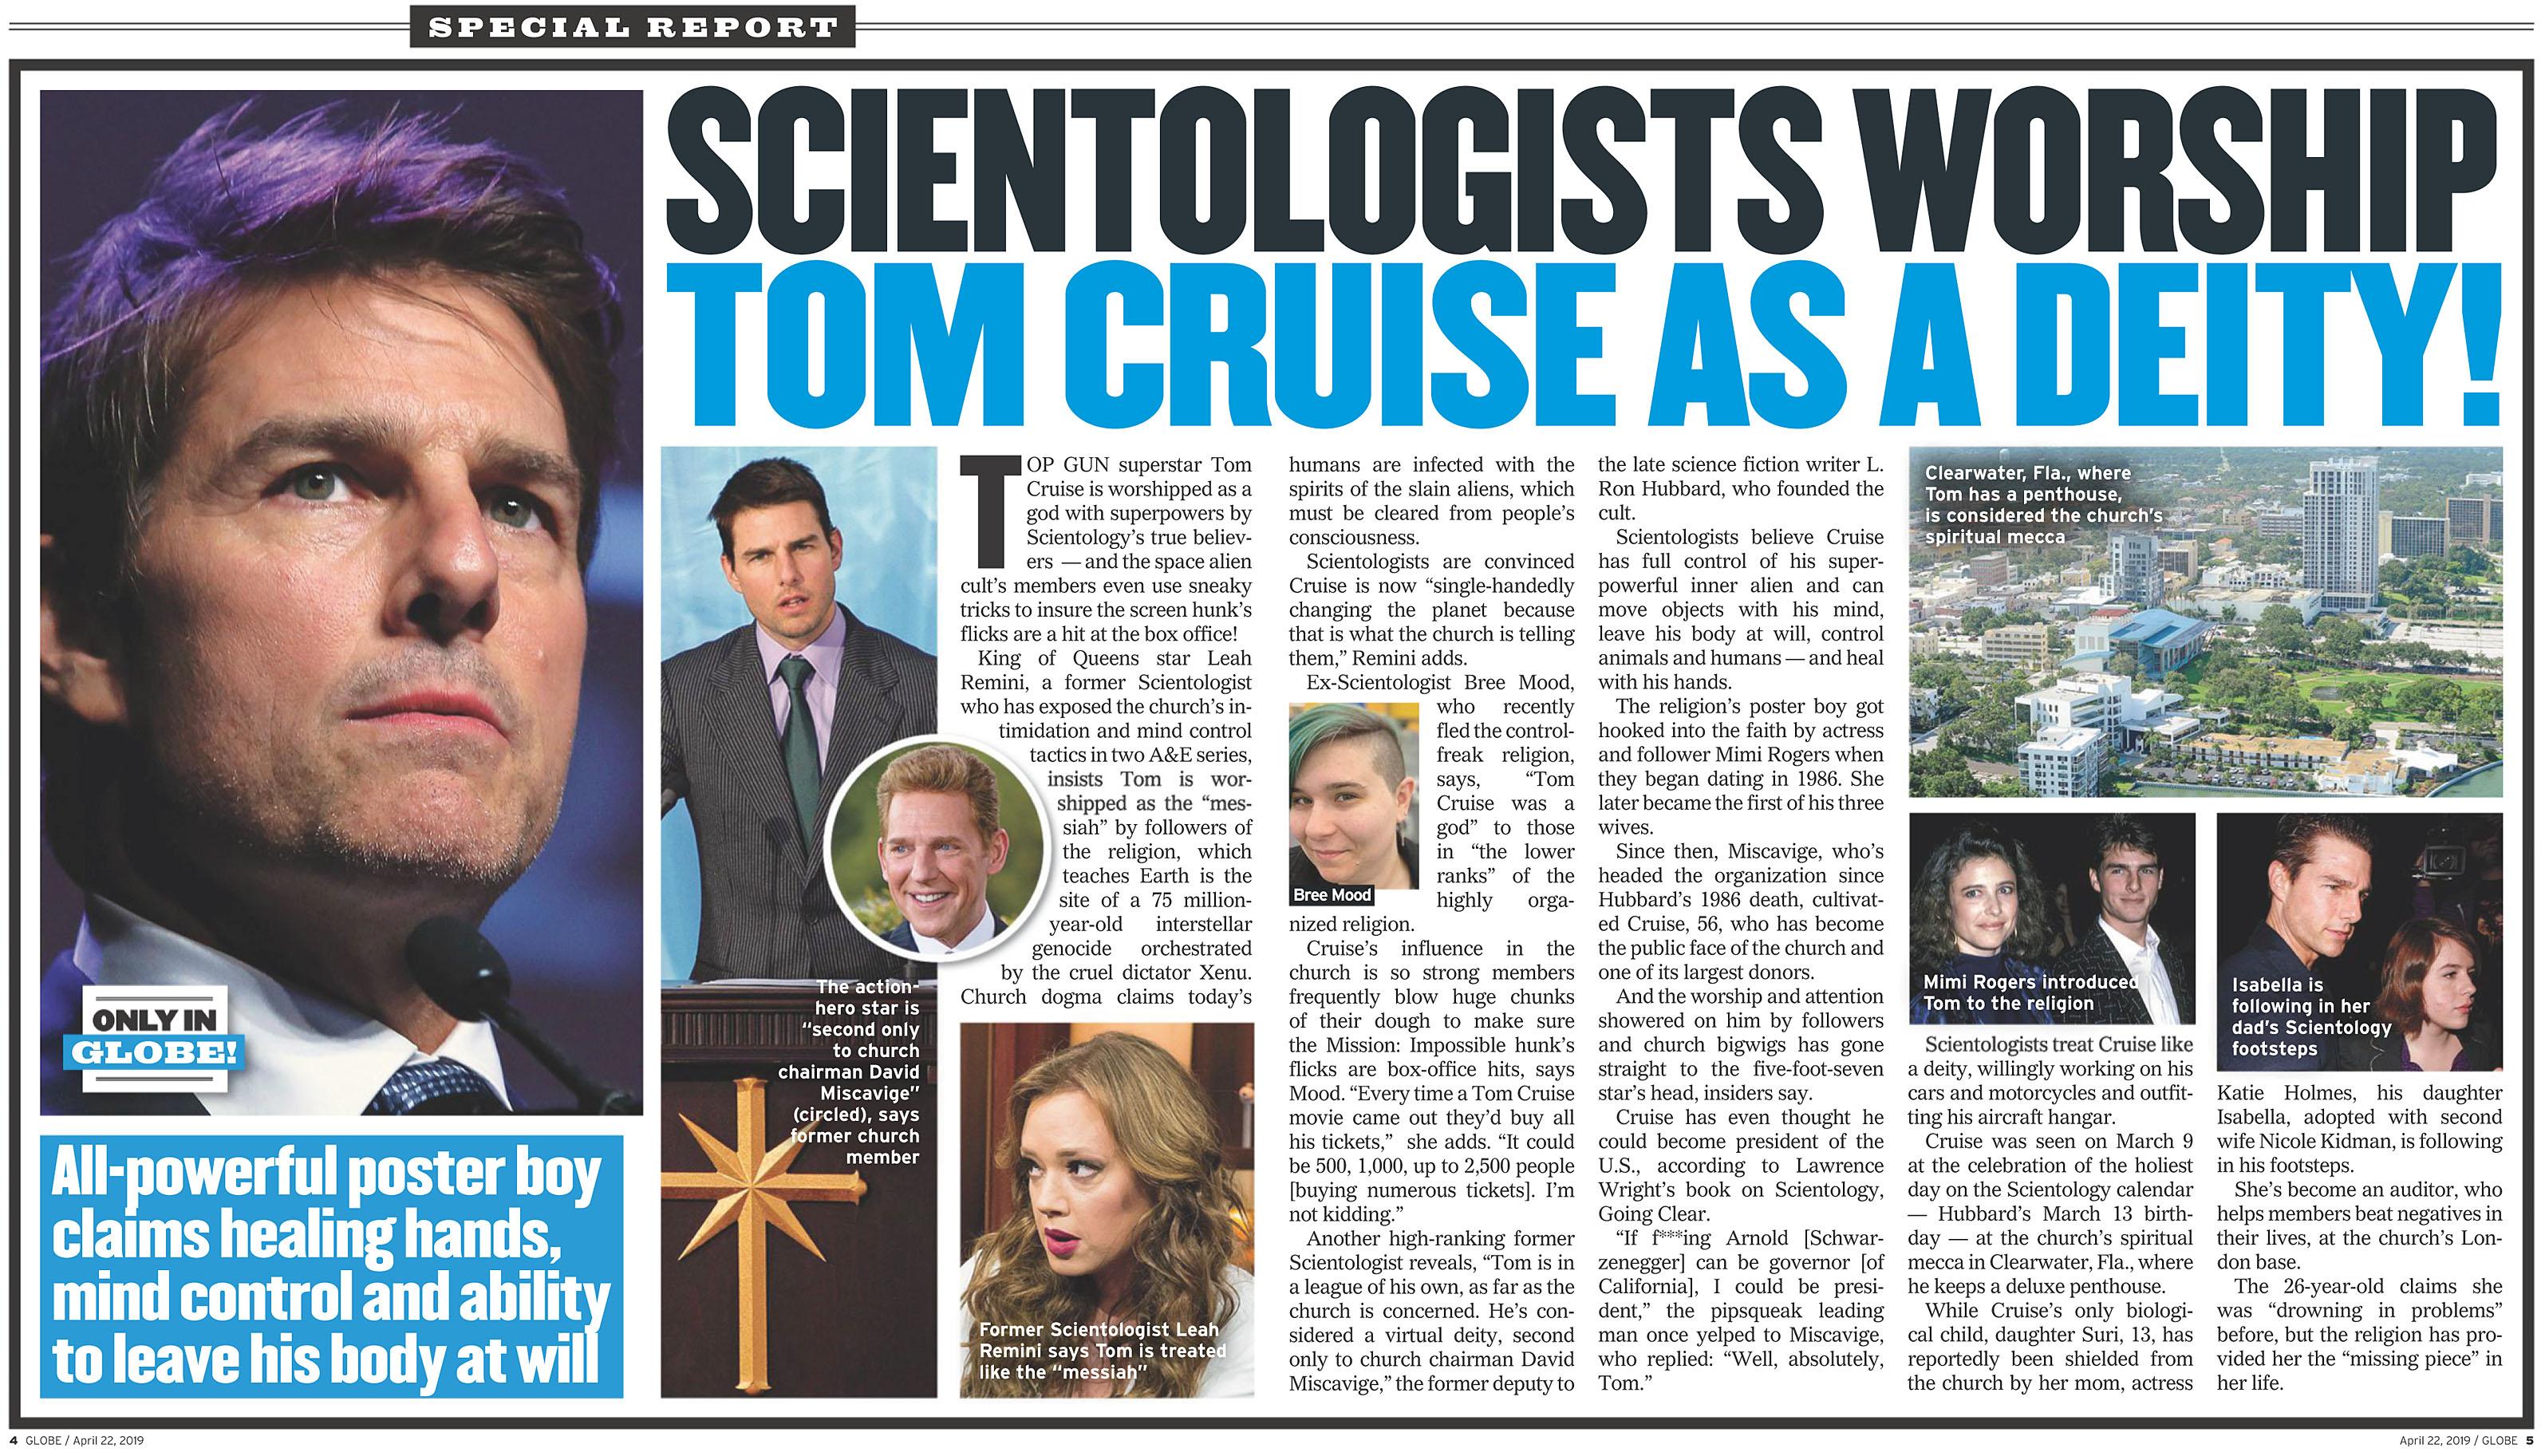 Globe 2019-04-22 Scientology.jpg